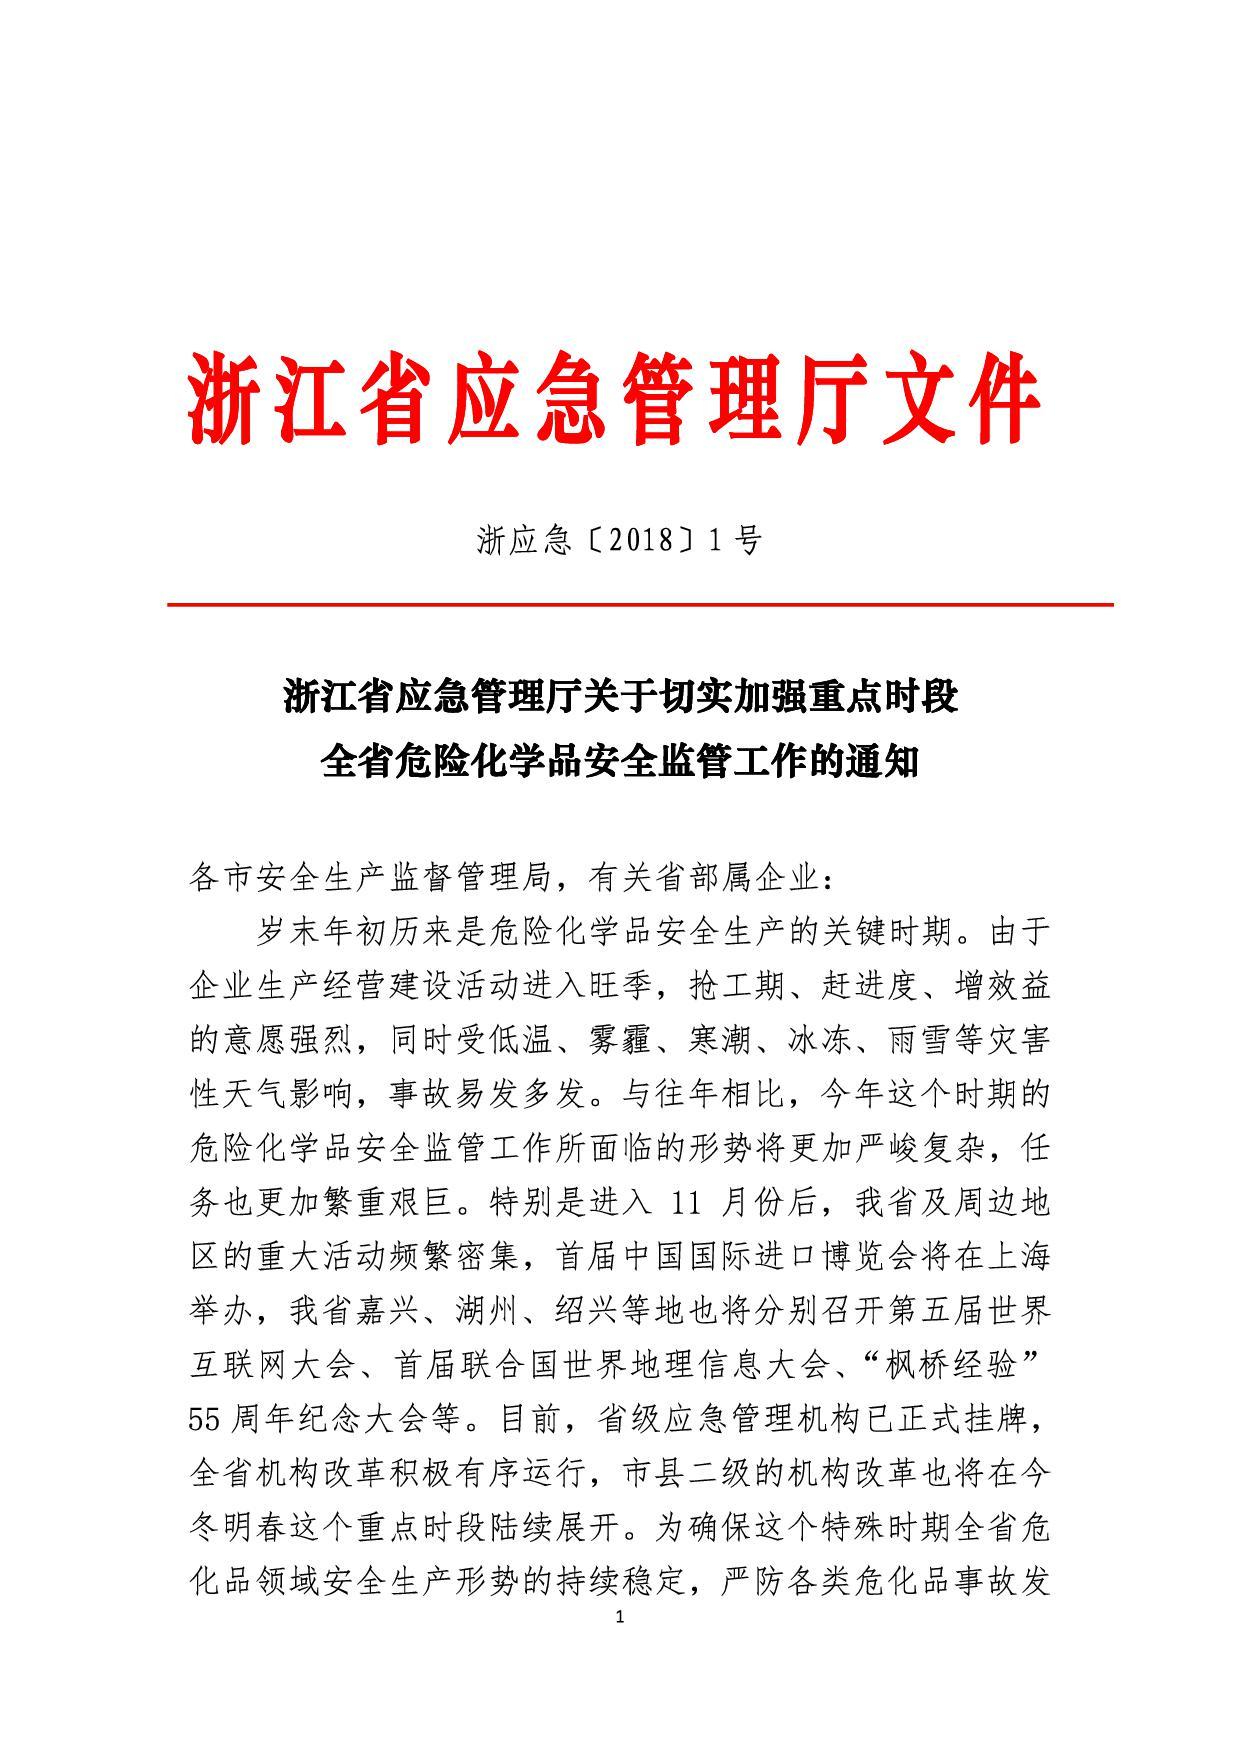 C_Users_hy_Desktop_省厅1号文��?pdf.jpg